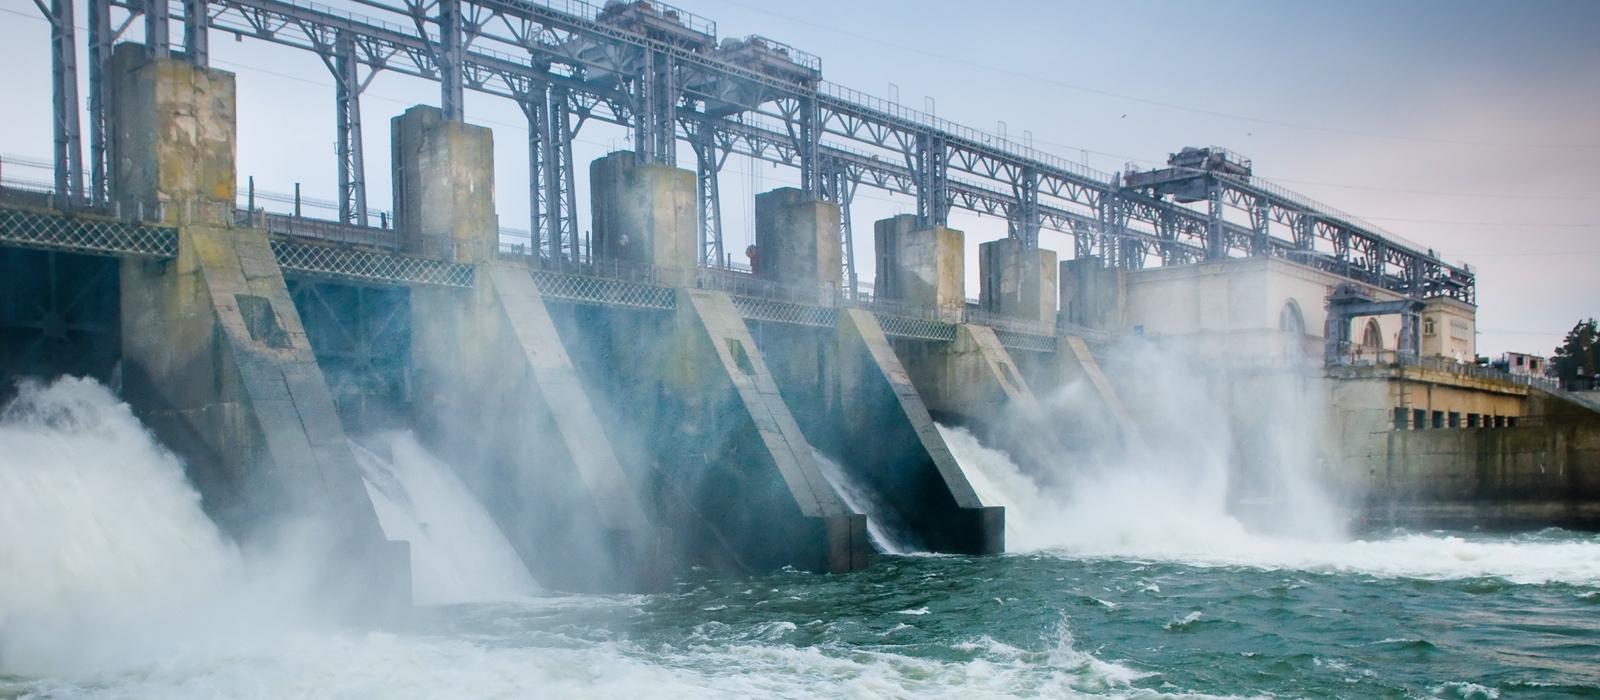 Hydropower plants